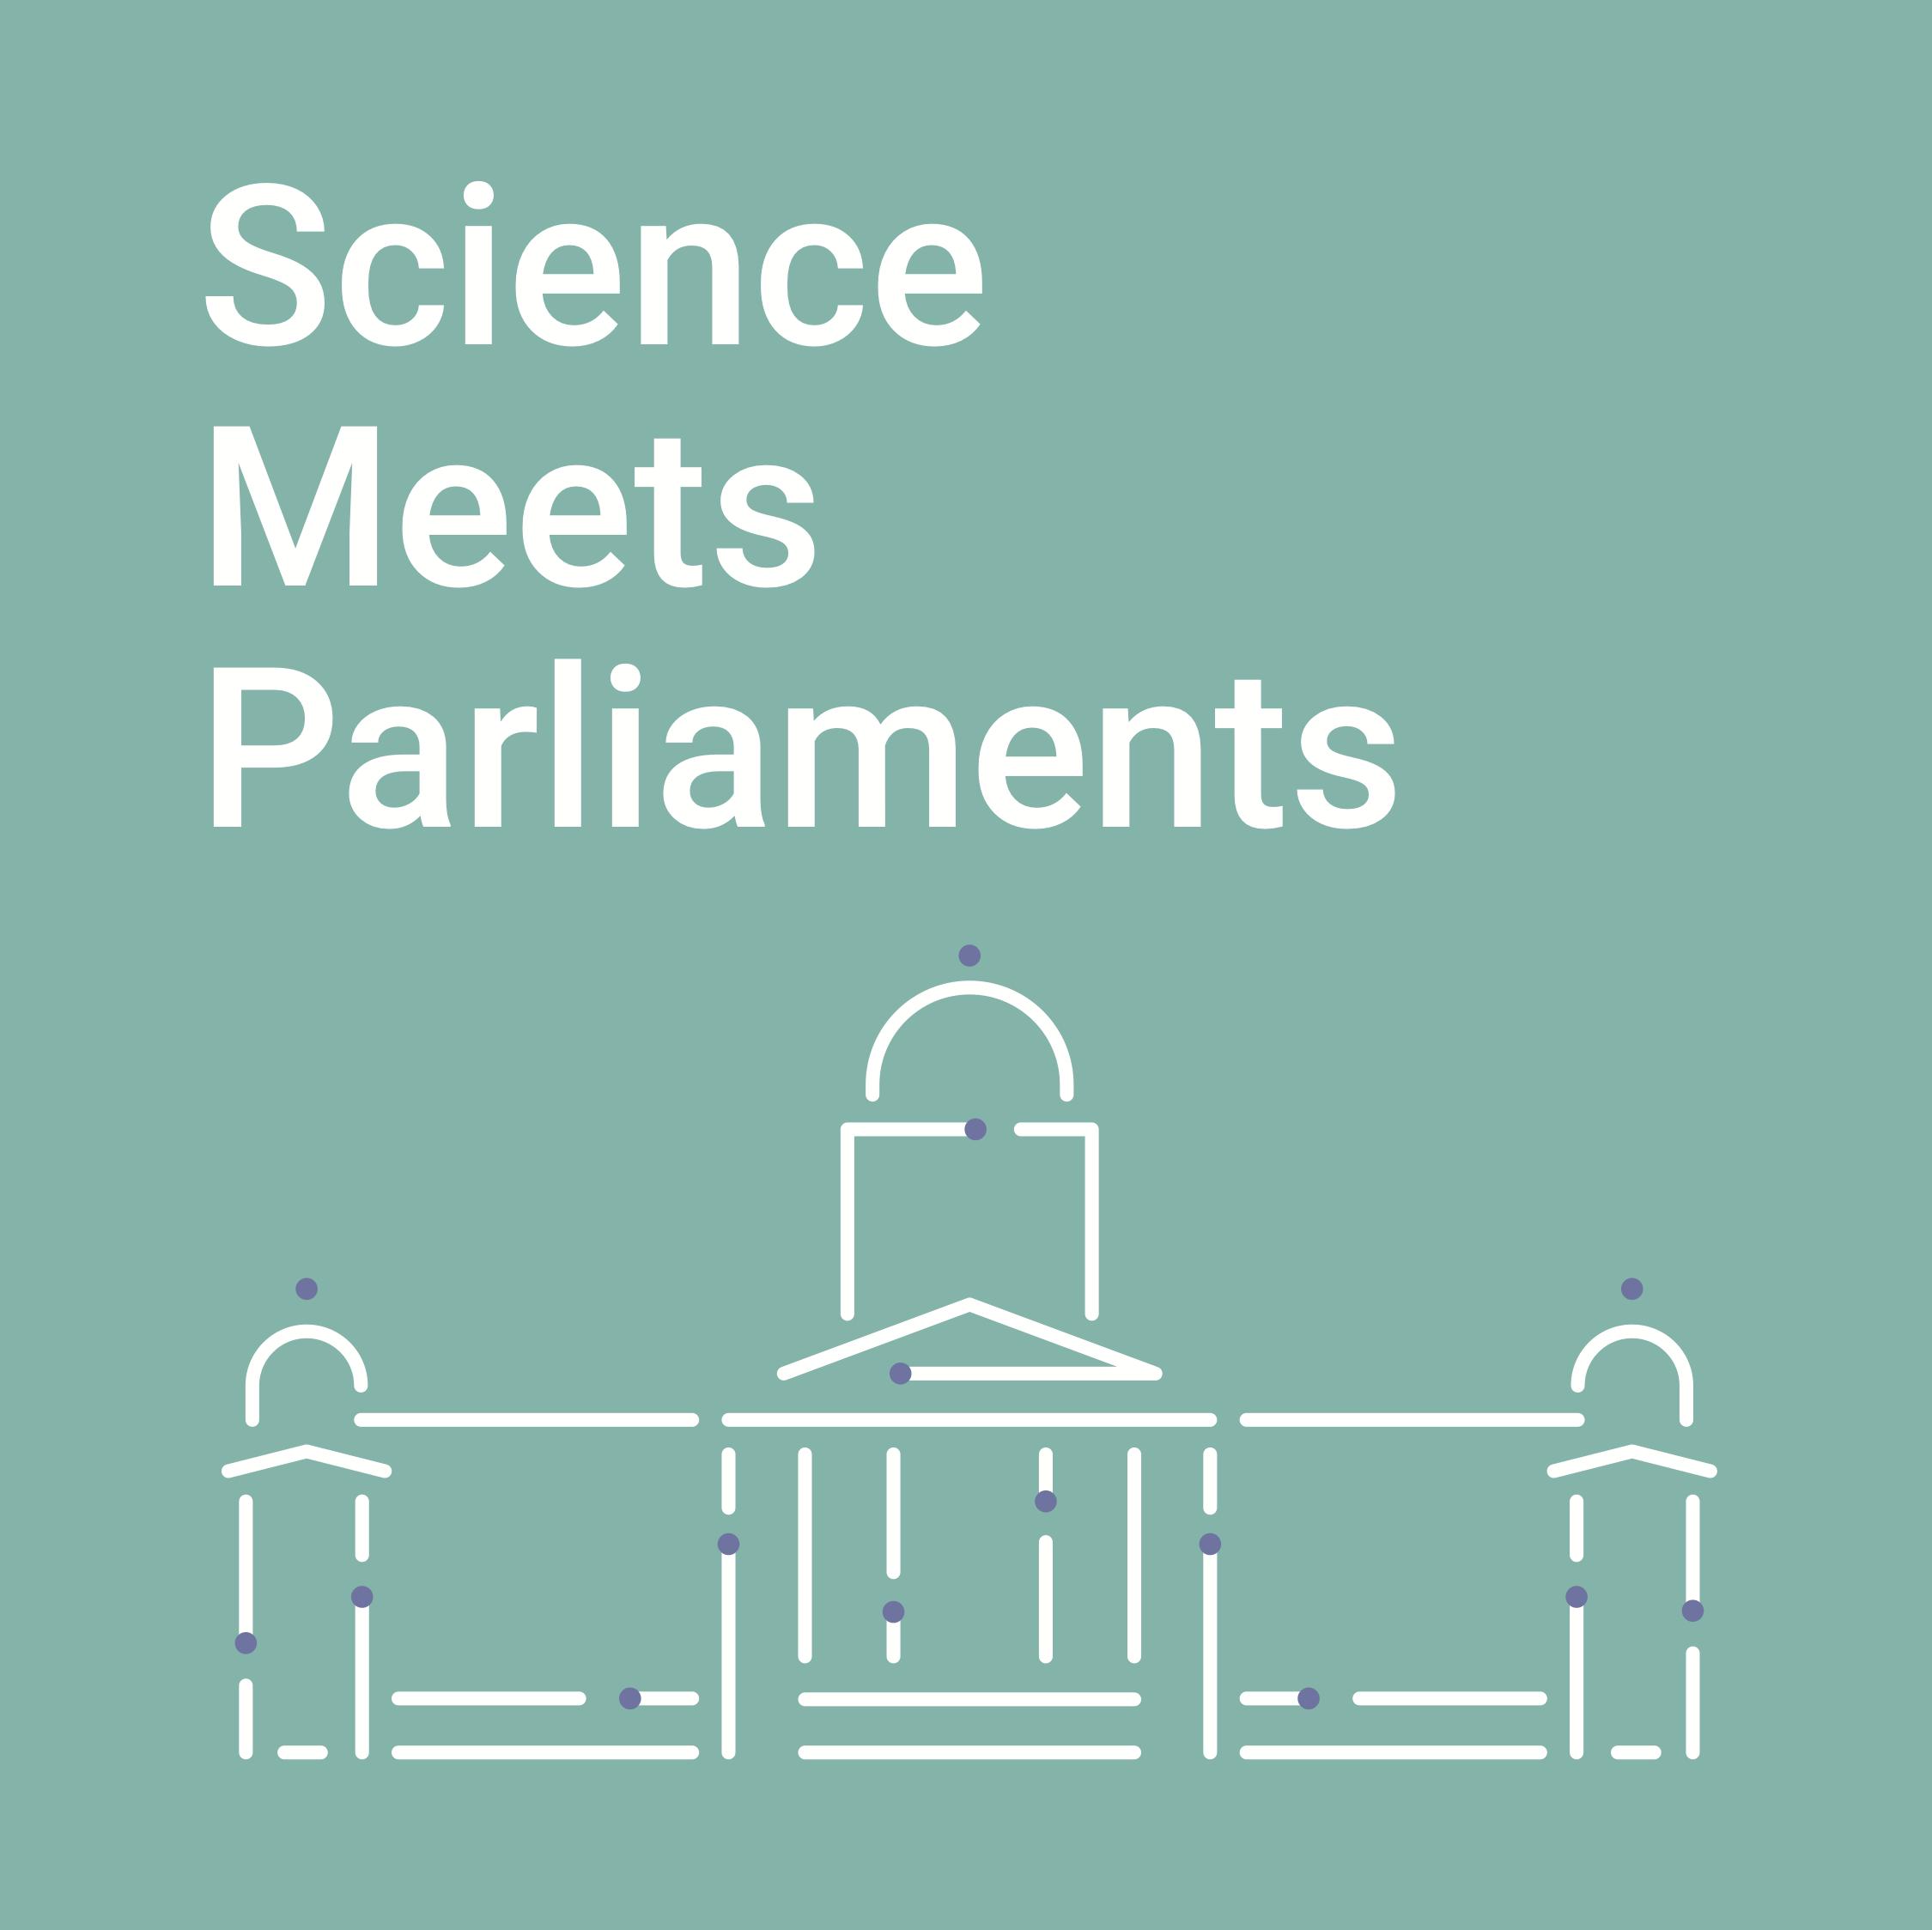 Science Meets Parliaments